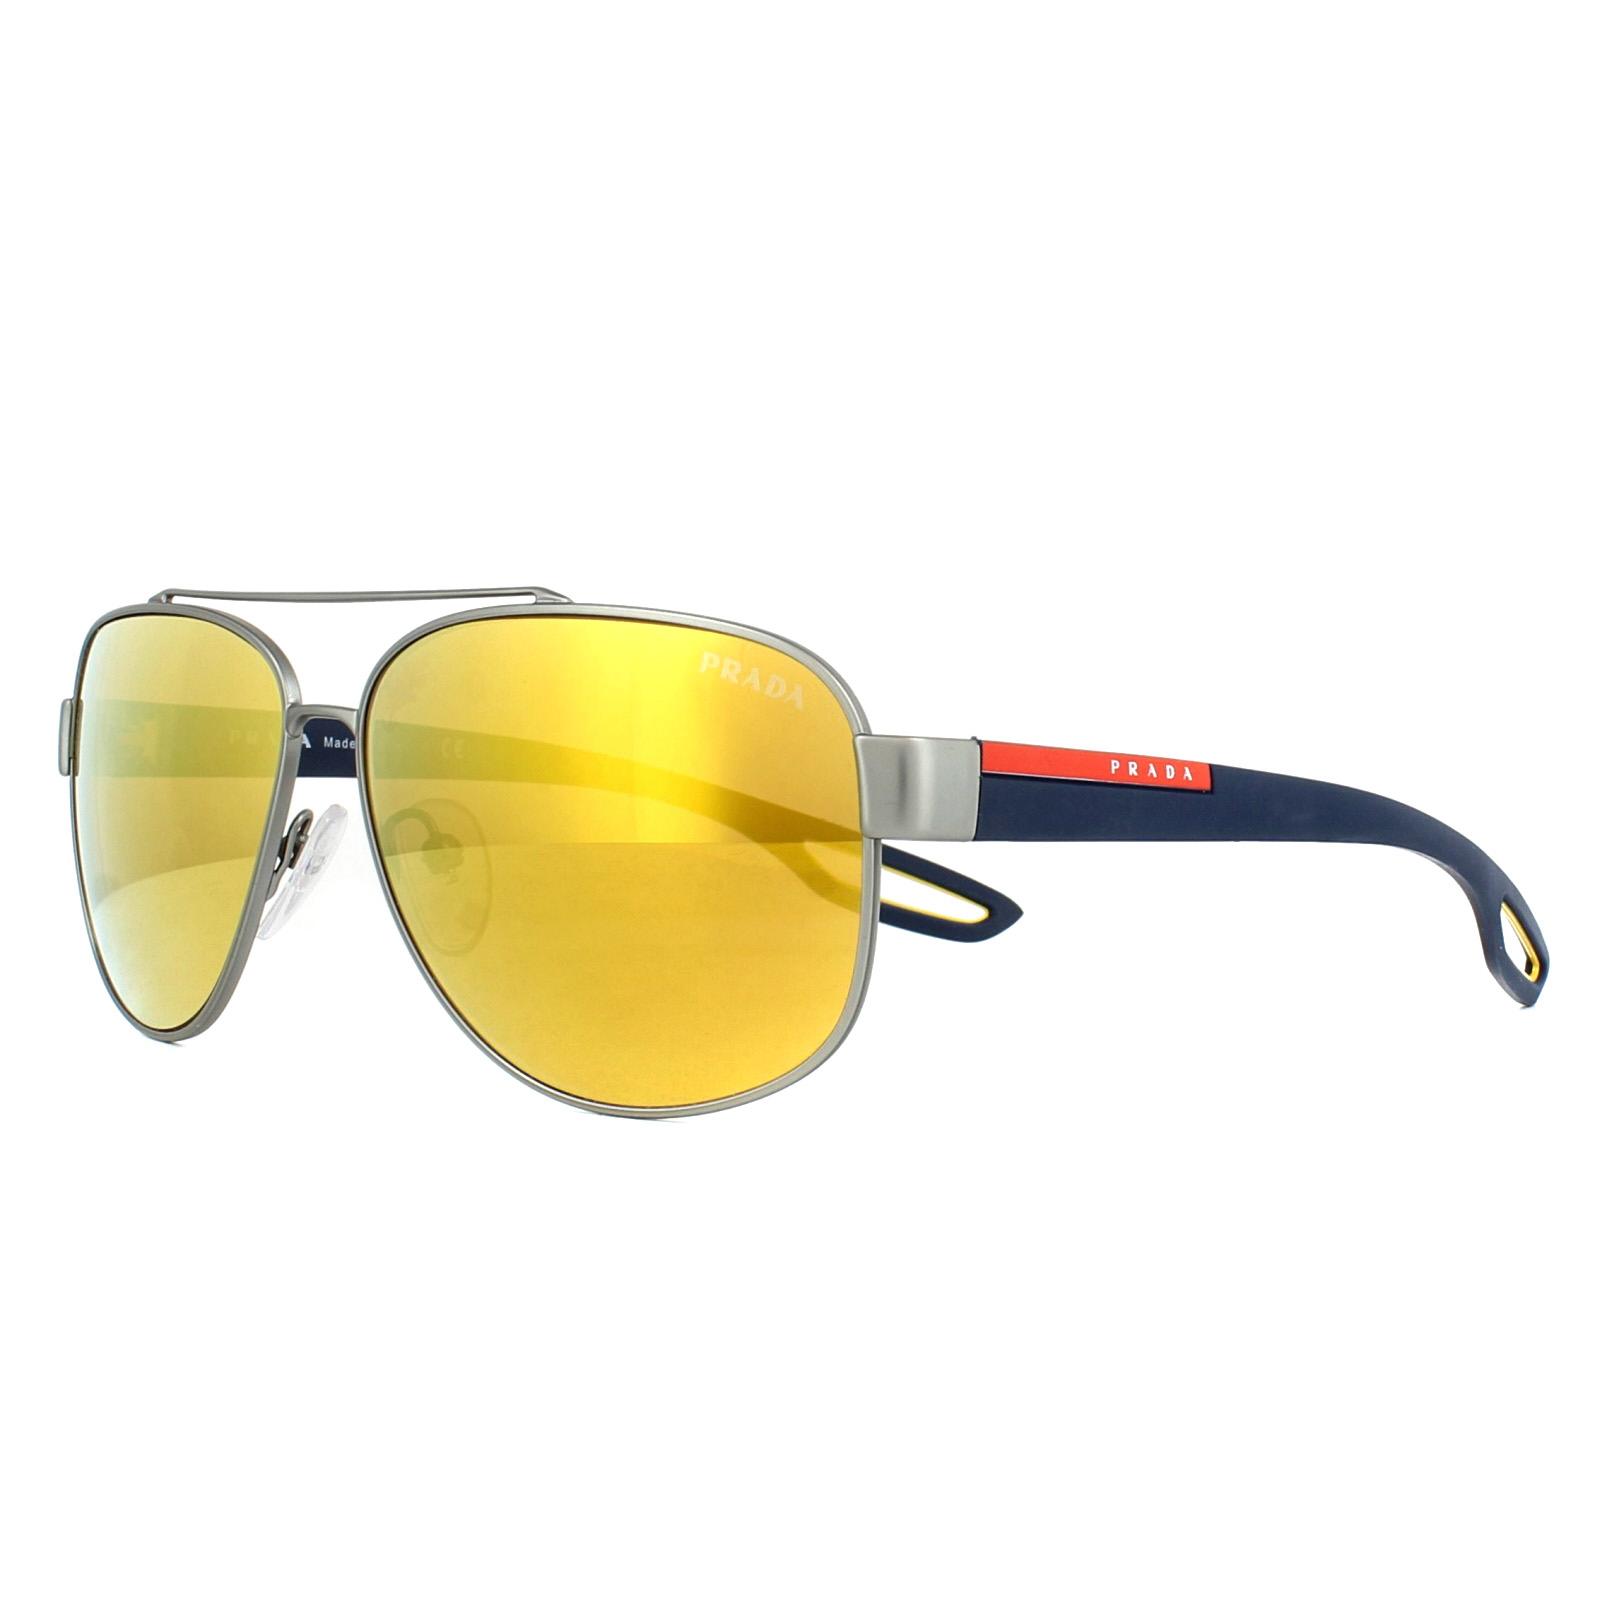 10d3ba7da9141 Sentinel Prada Sport Sunglasses 58QS DG15N0 Ruthenium Rubber Brown 24K  Iridium 60mm